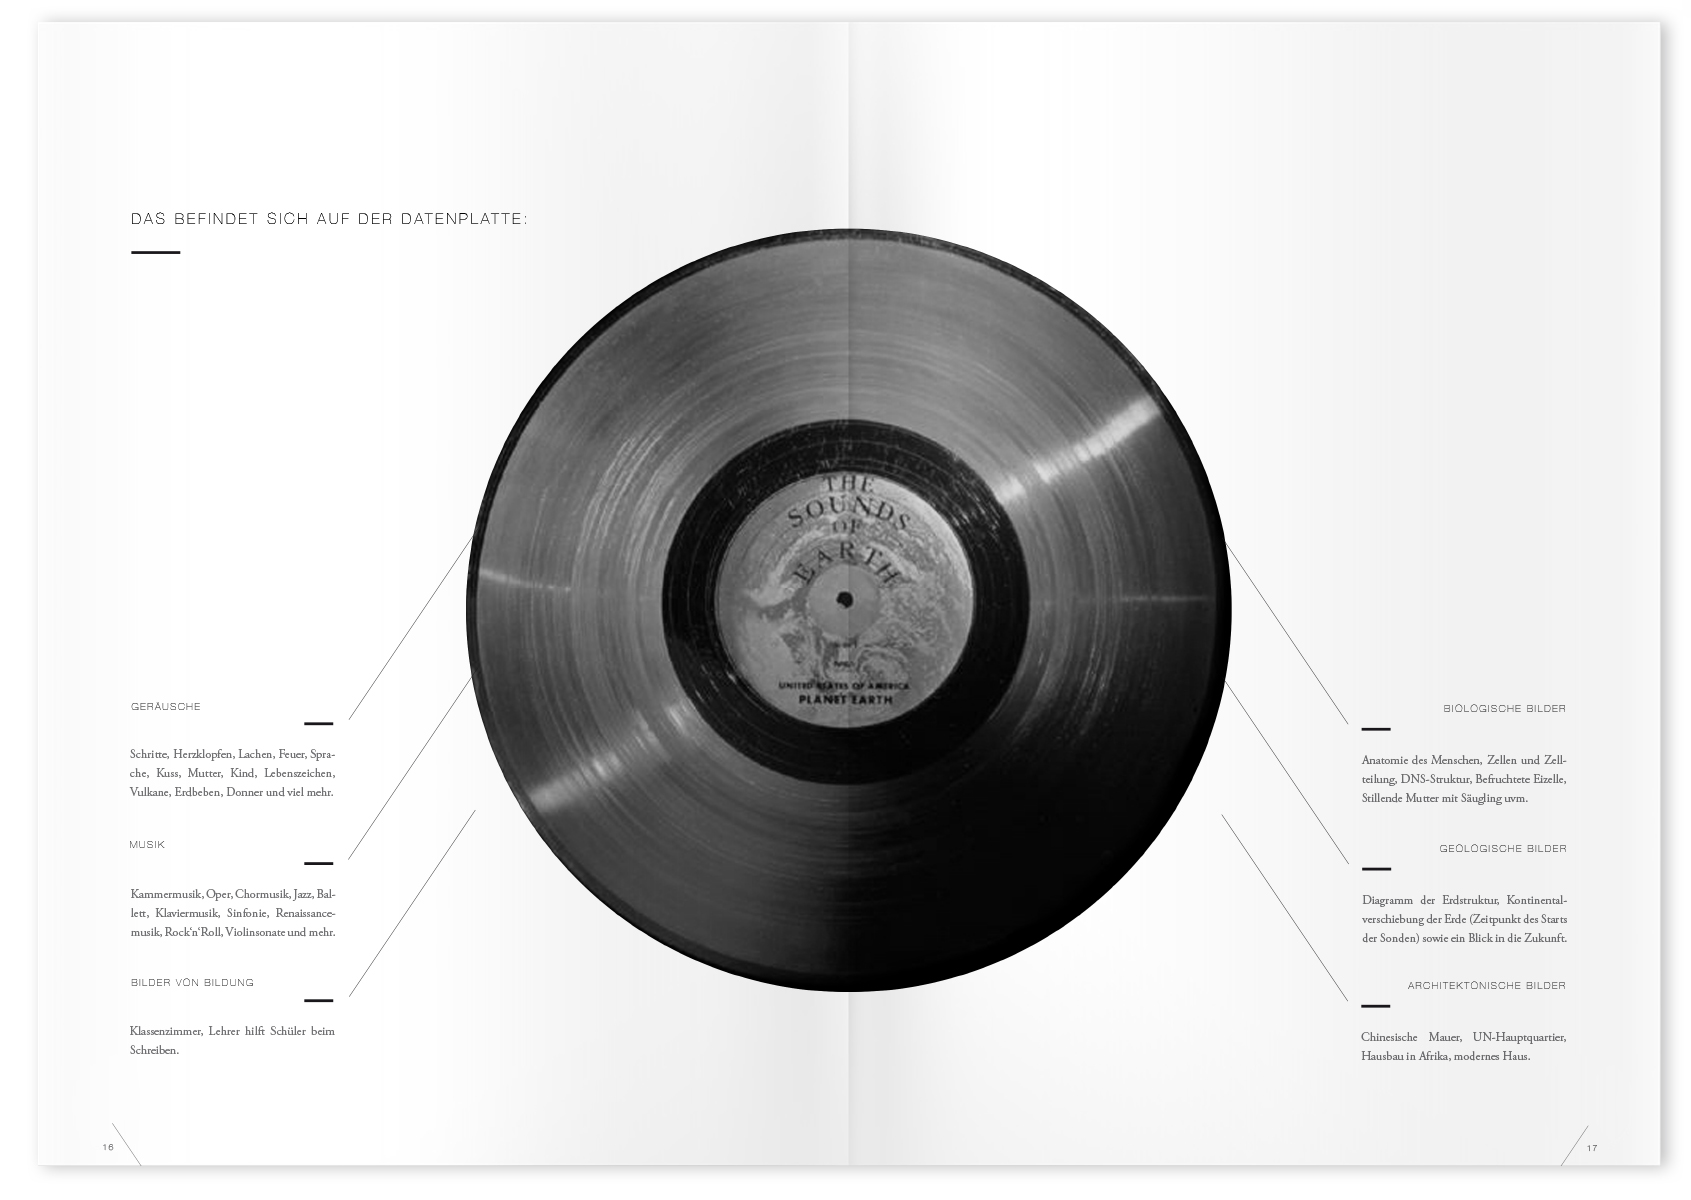 03_Cosmos-Magazin_hsrm-Hochschule-RheinMain_Editorial-Design_Grafikdesign_Gloria-Kison.jpg